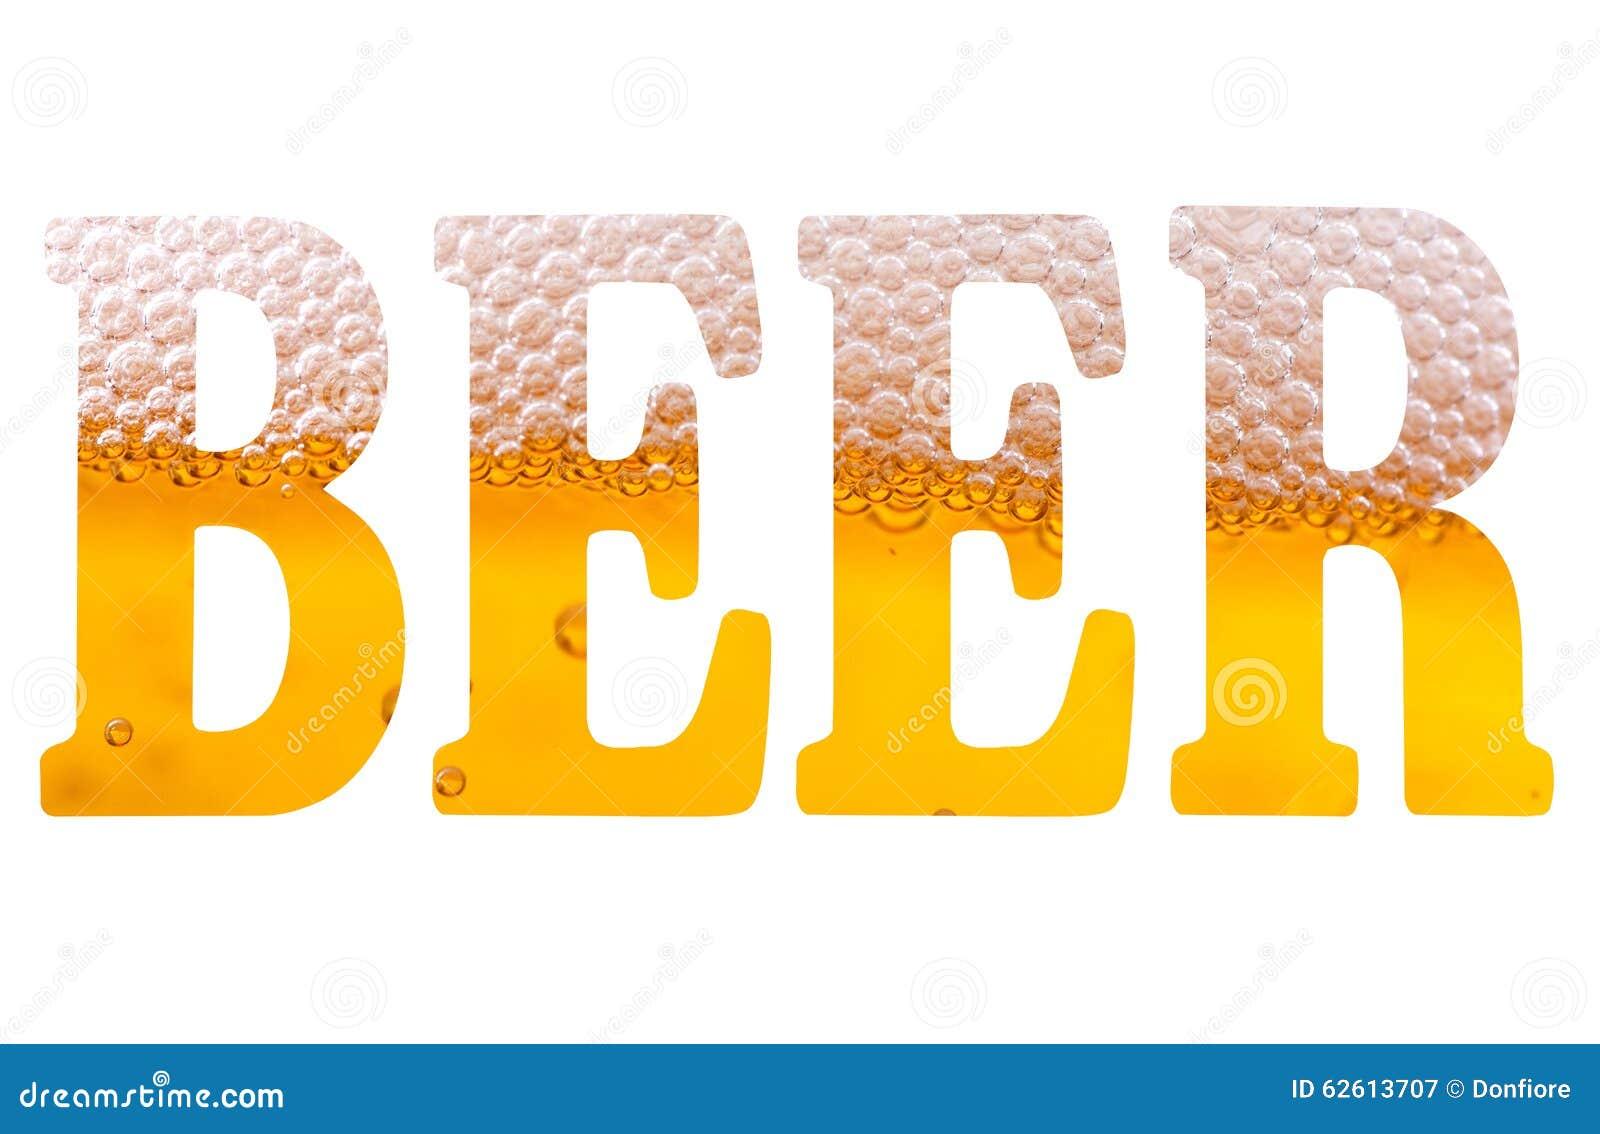 word document background image size